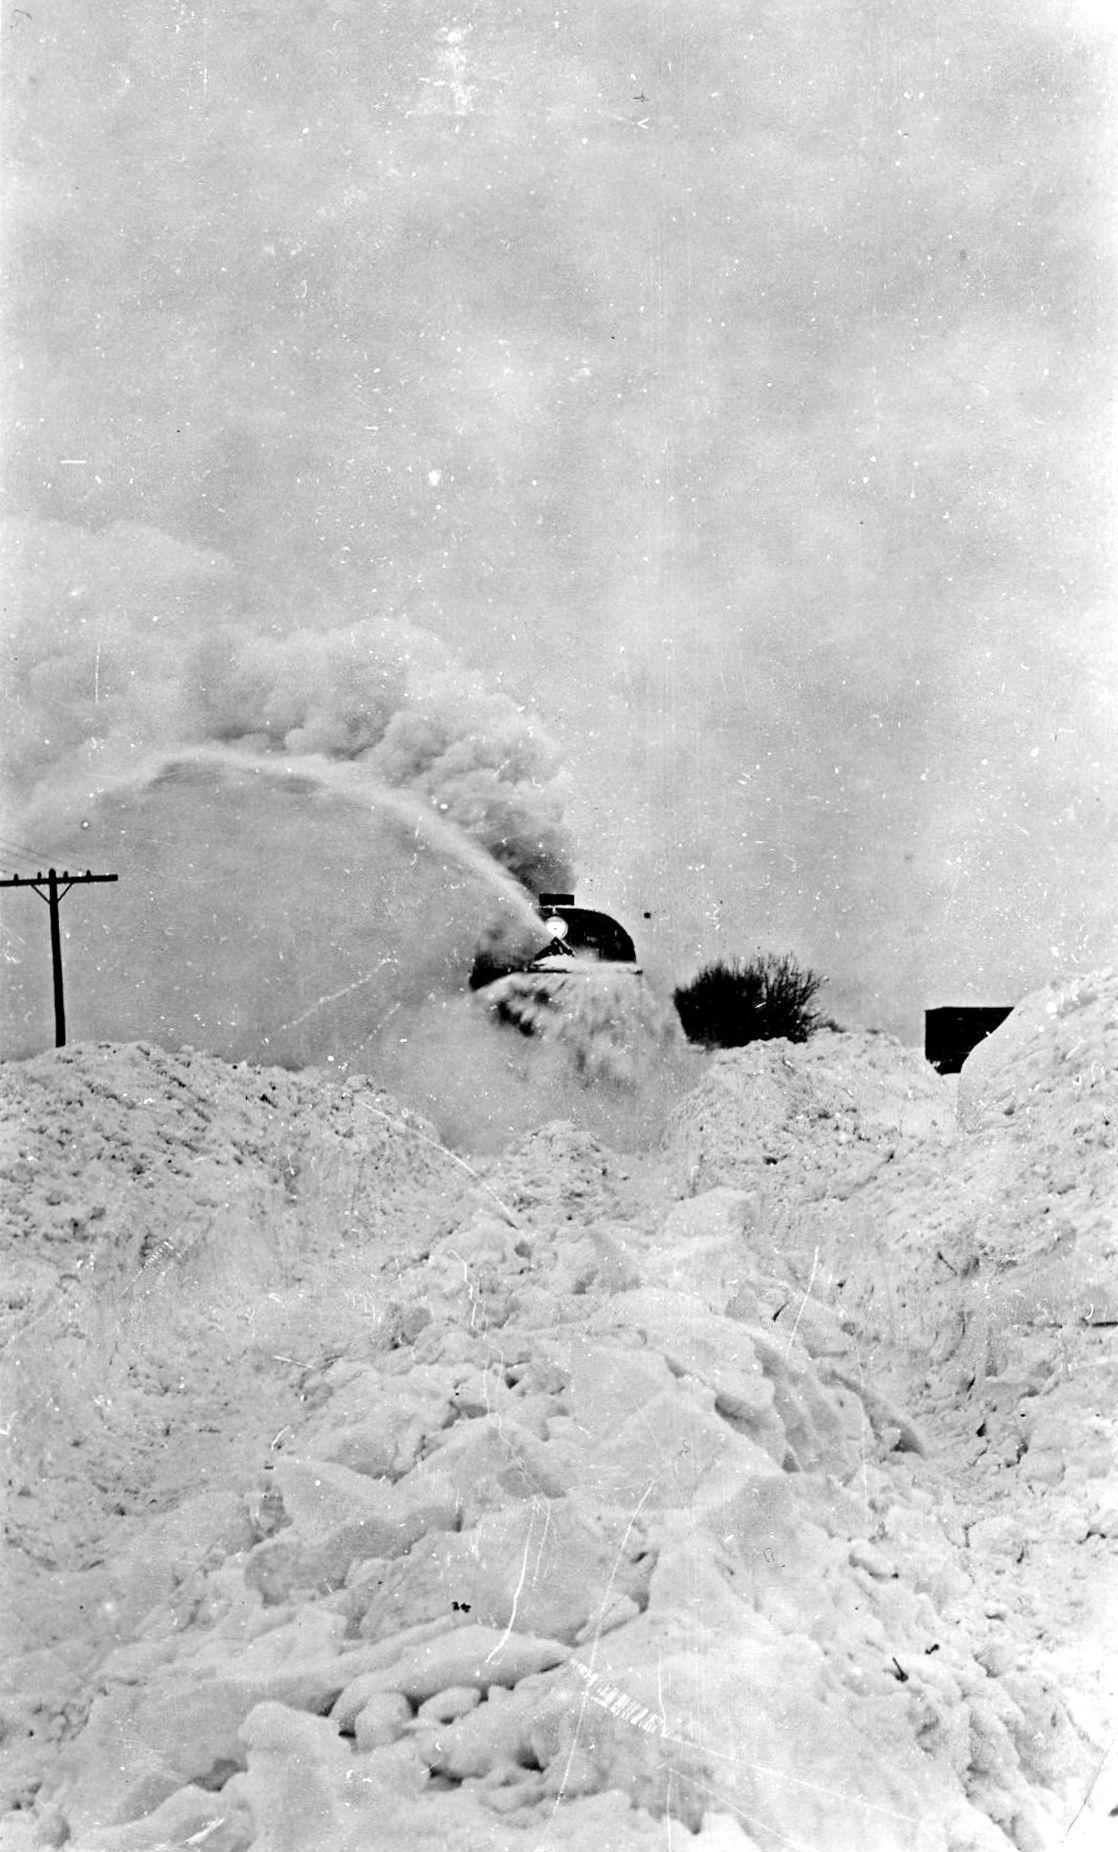 181231_SNOW01